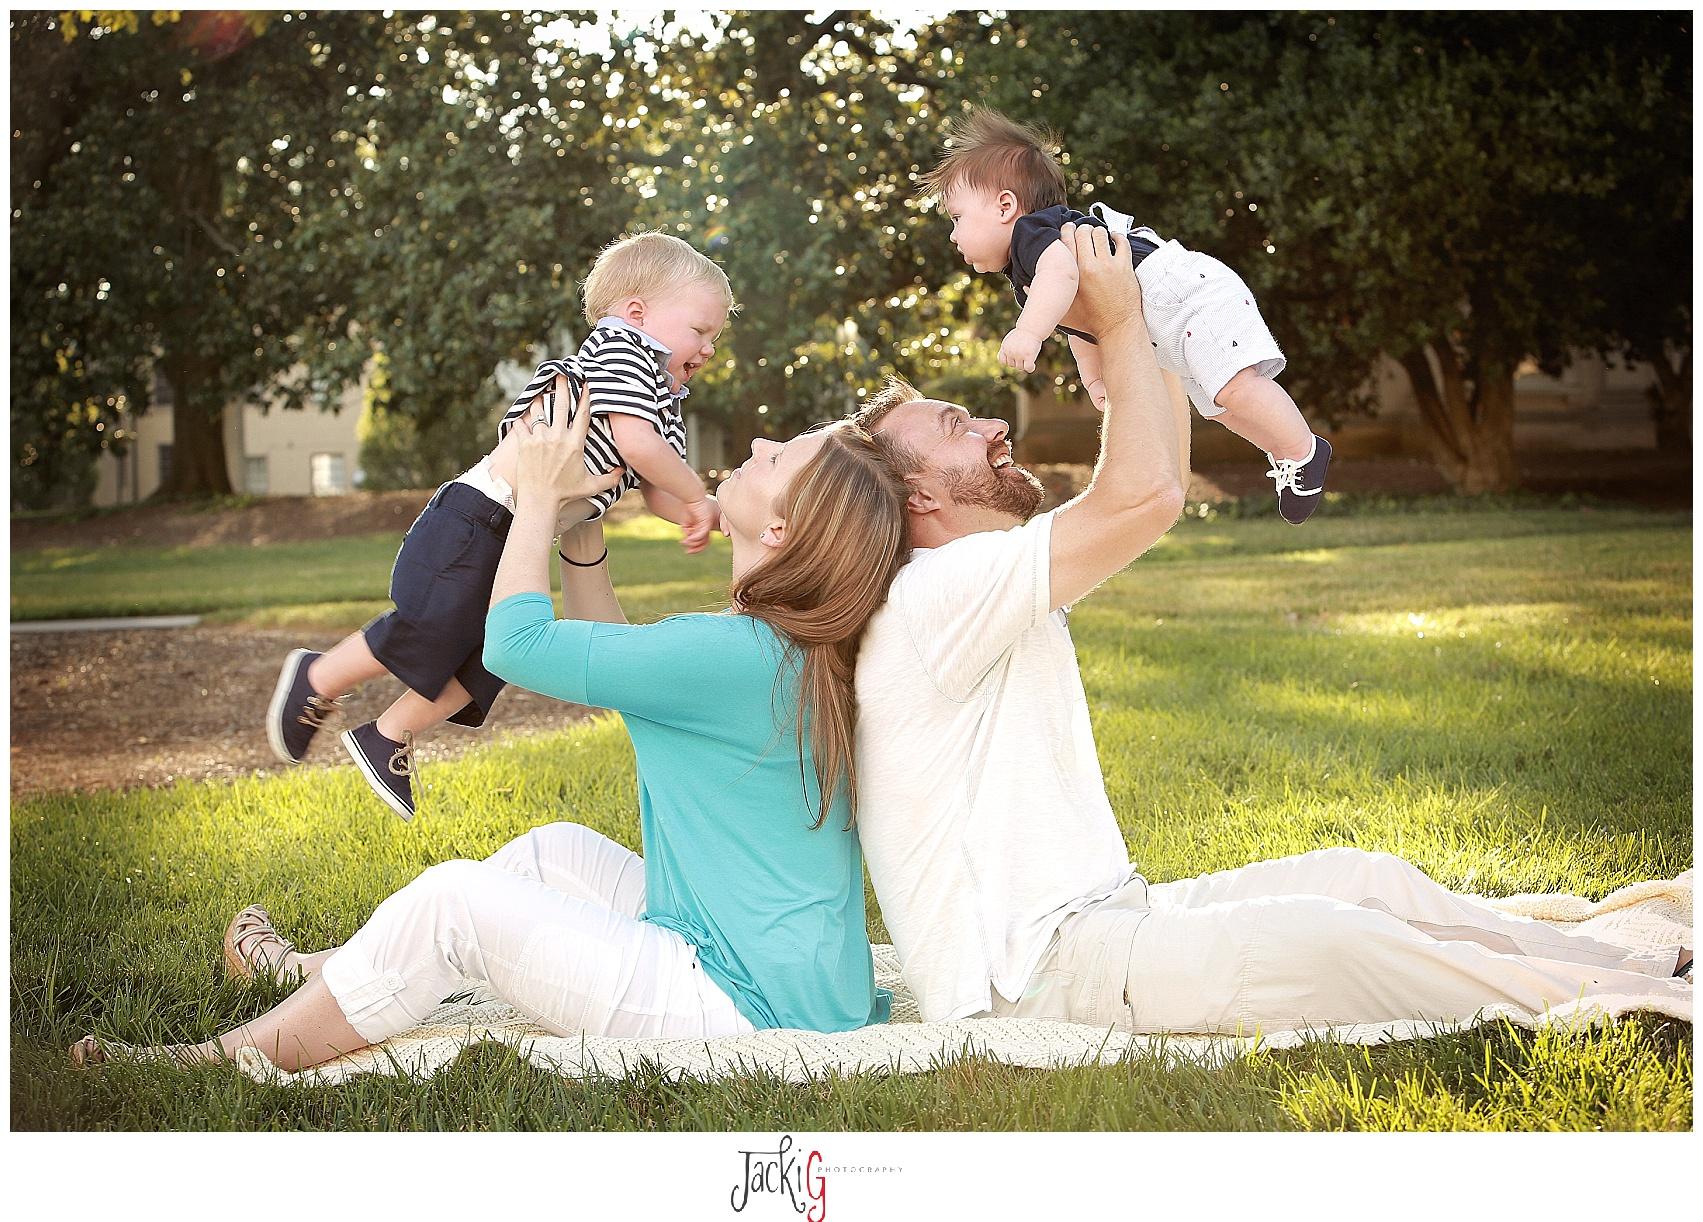 #familyphotography